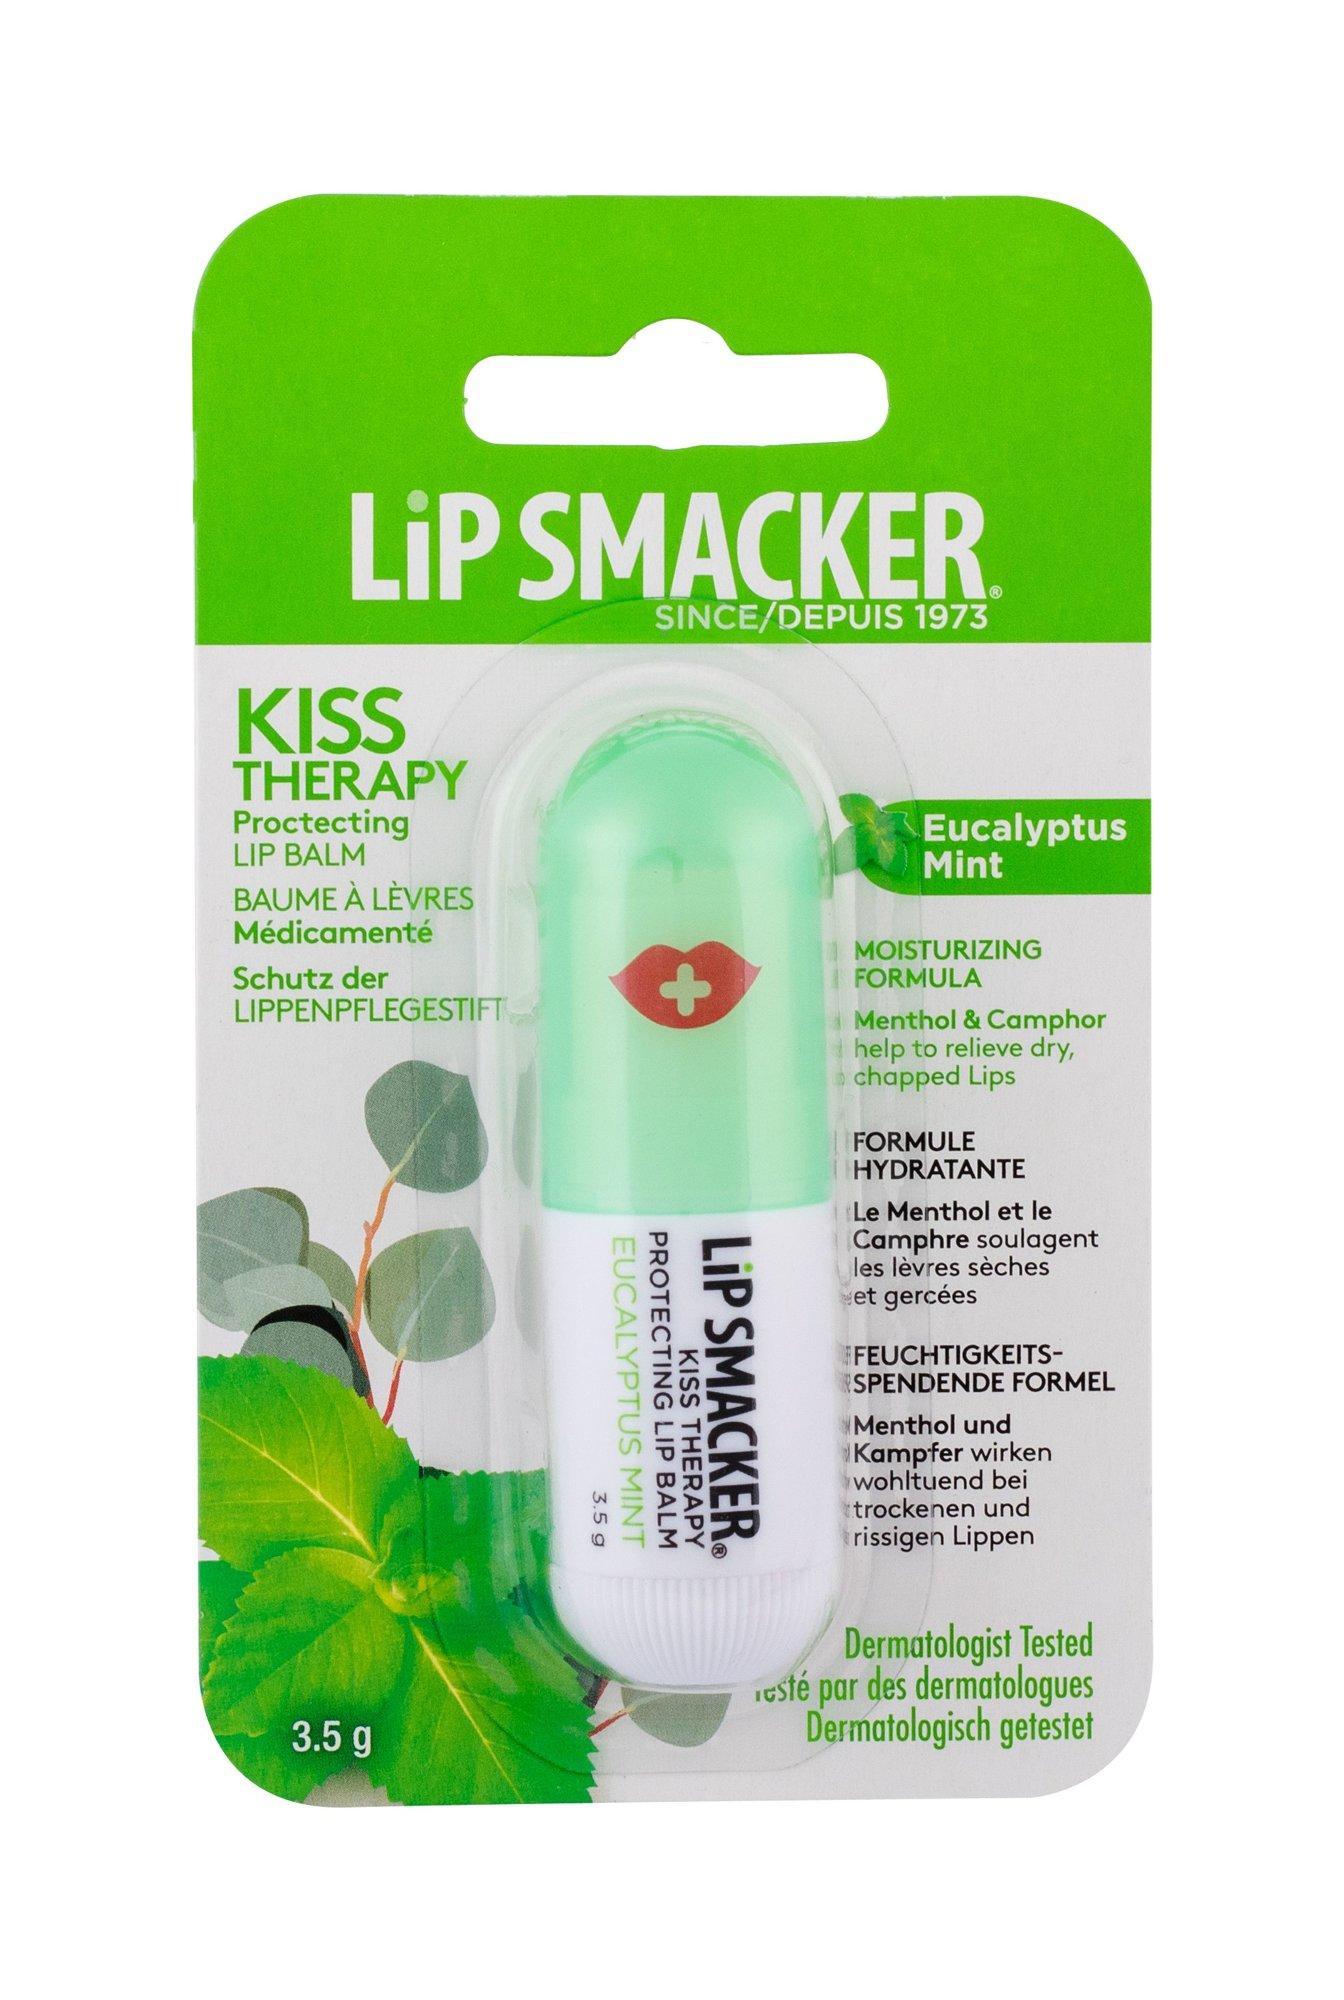 Lip Smacker Kiss Therapy Lip Balm 3,5ml Eucalyptus Mint